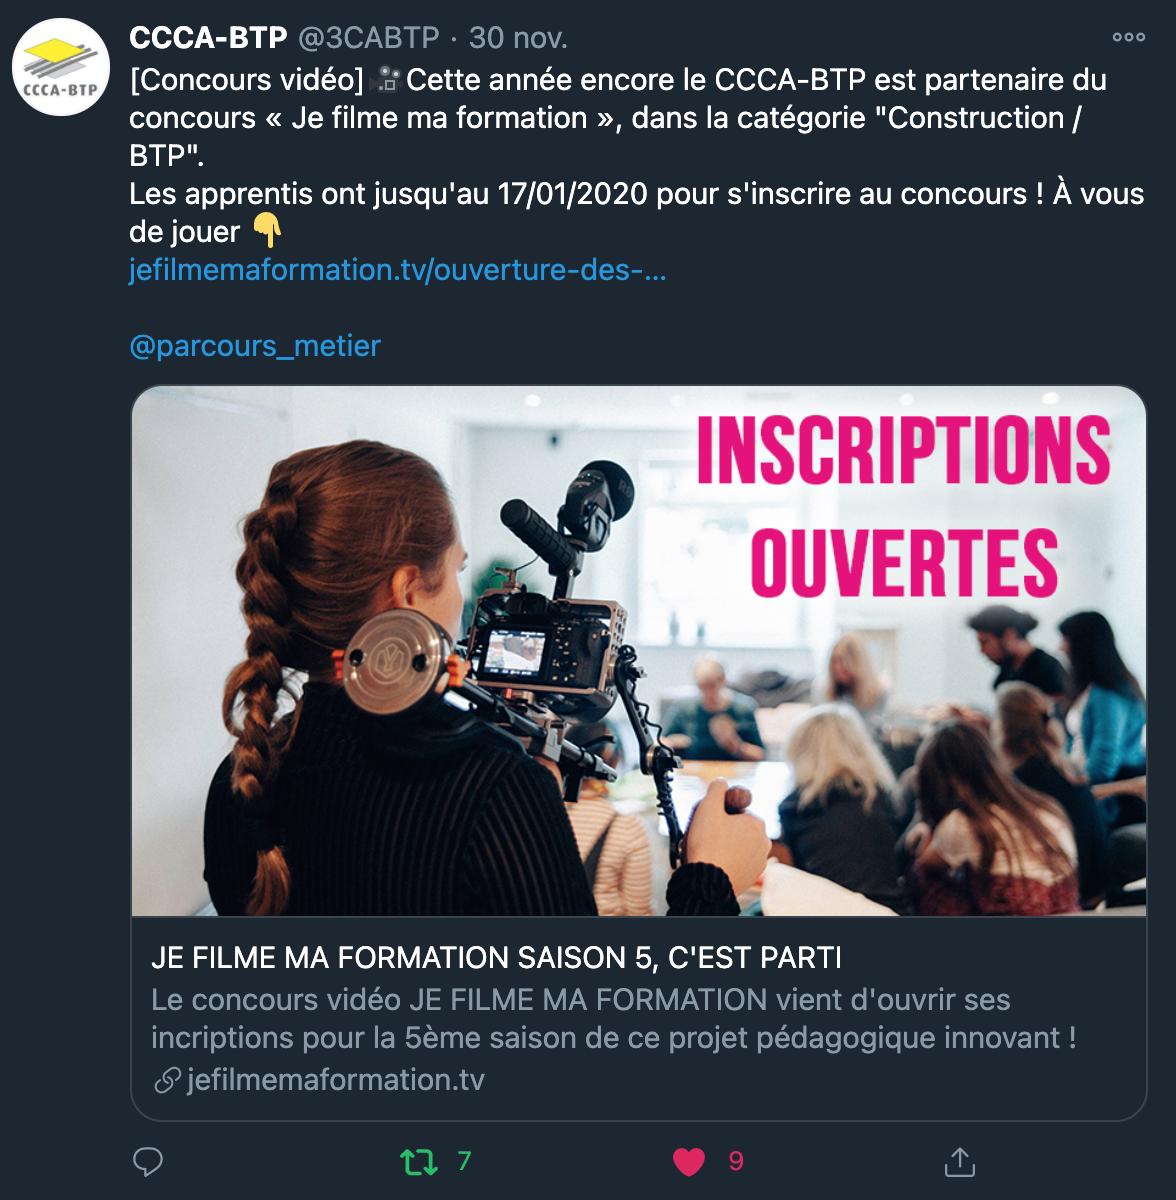 CCCA BTP - 30/11/2020